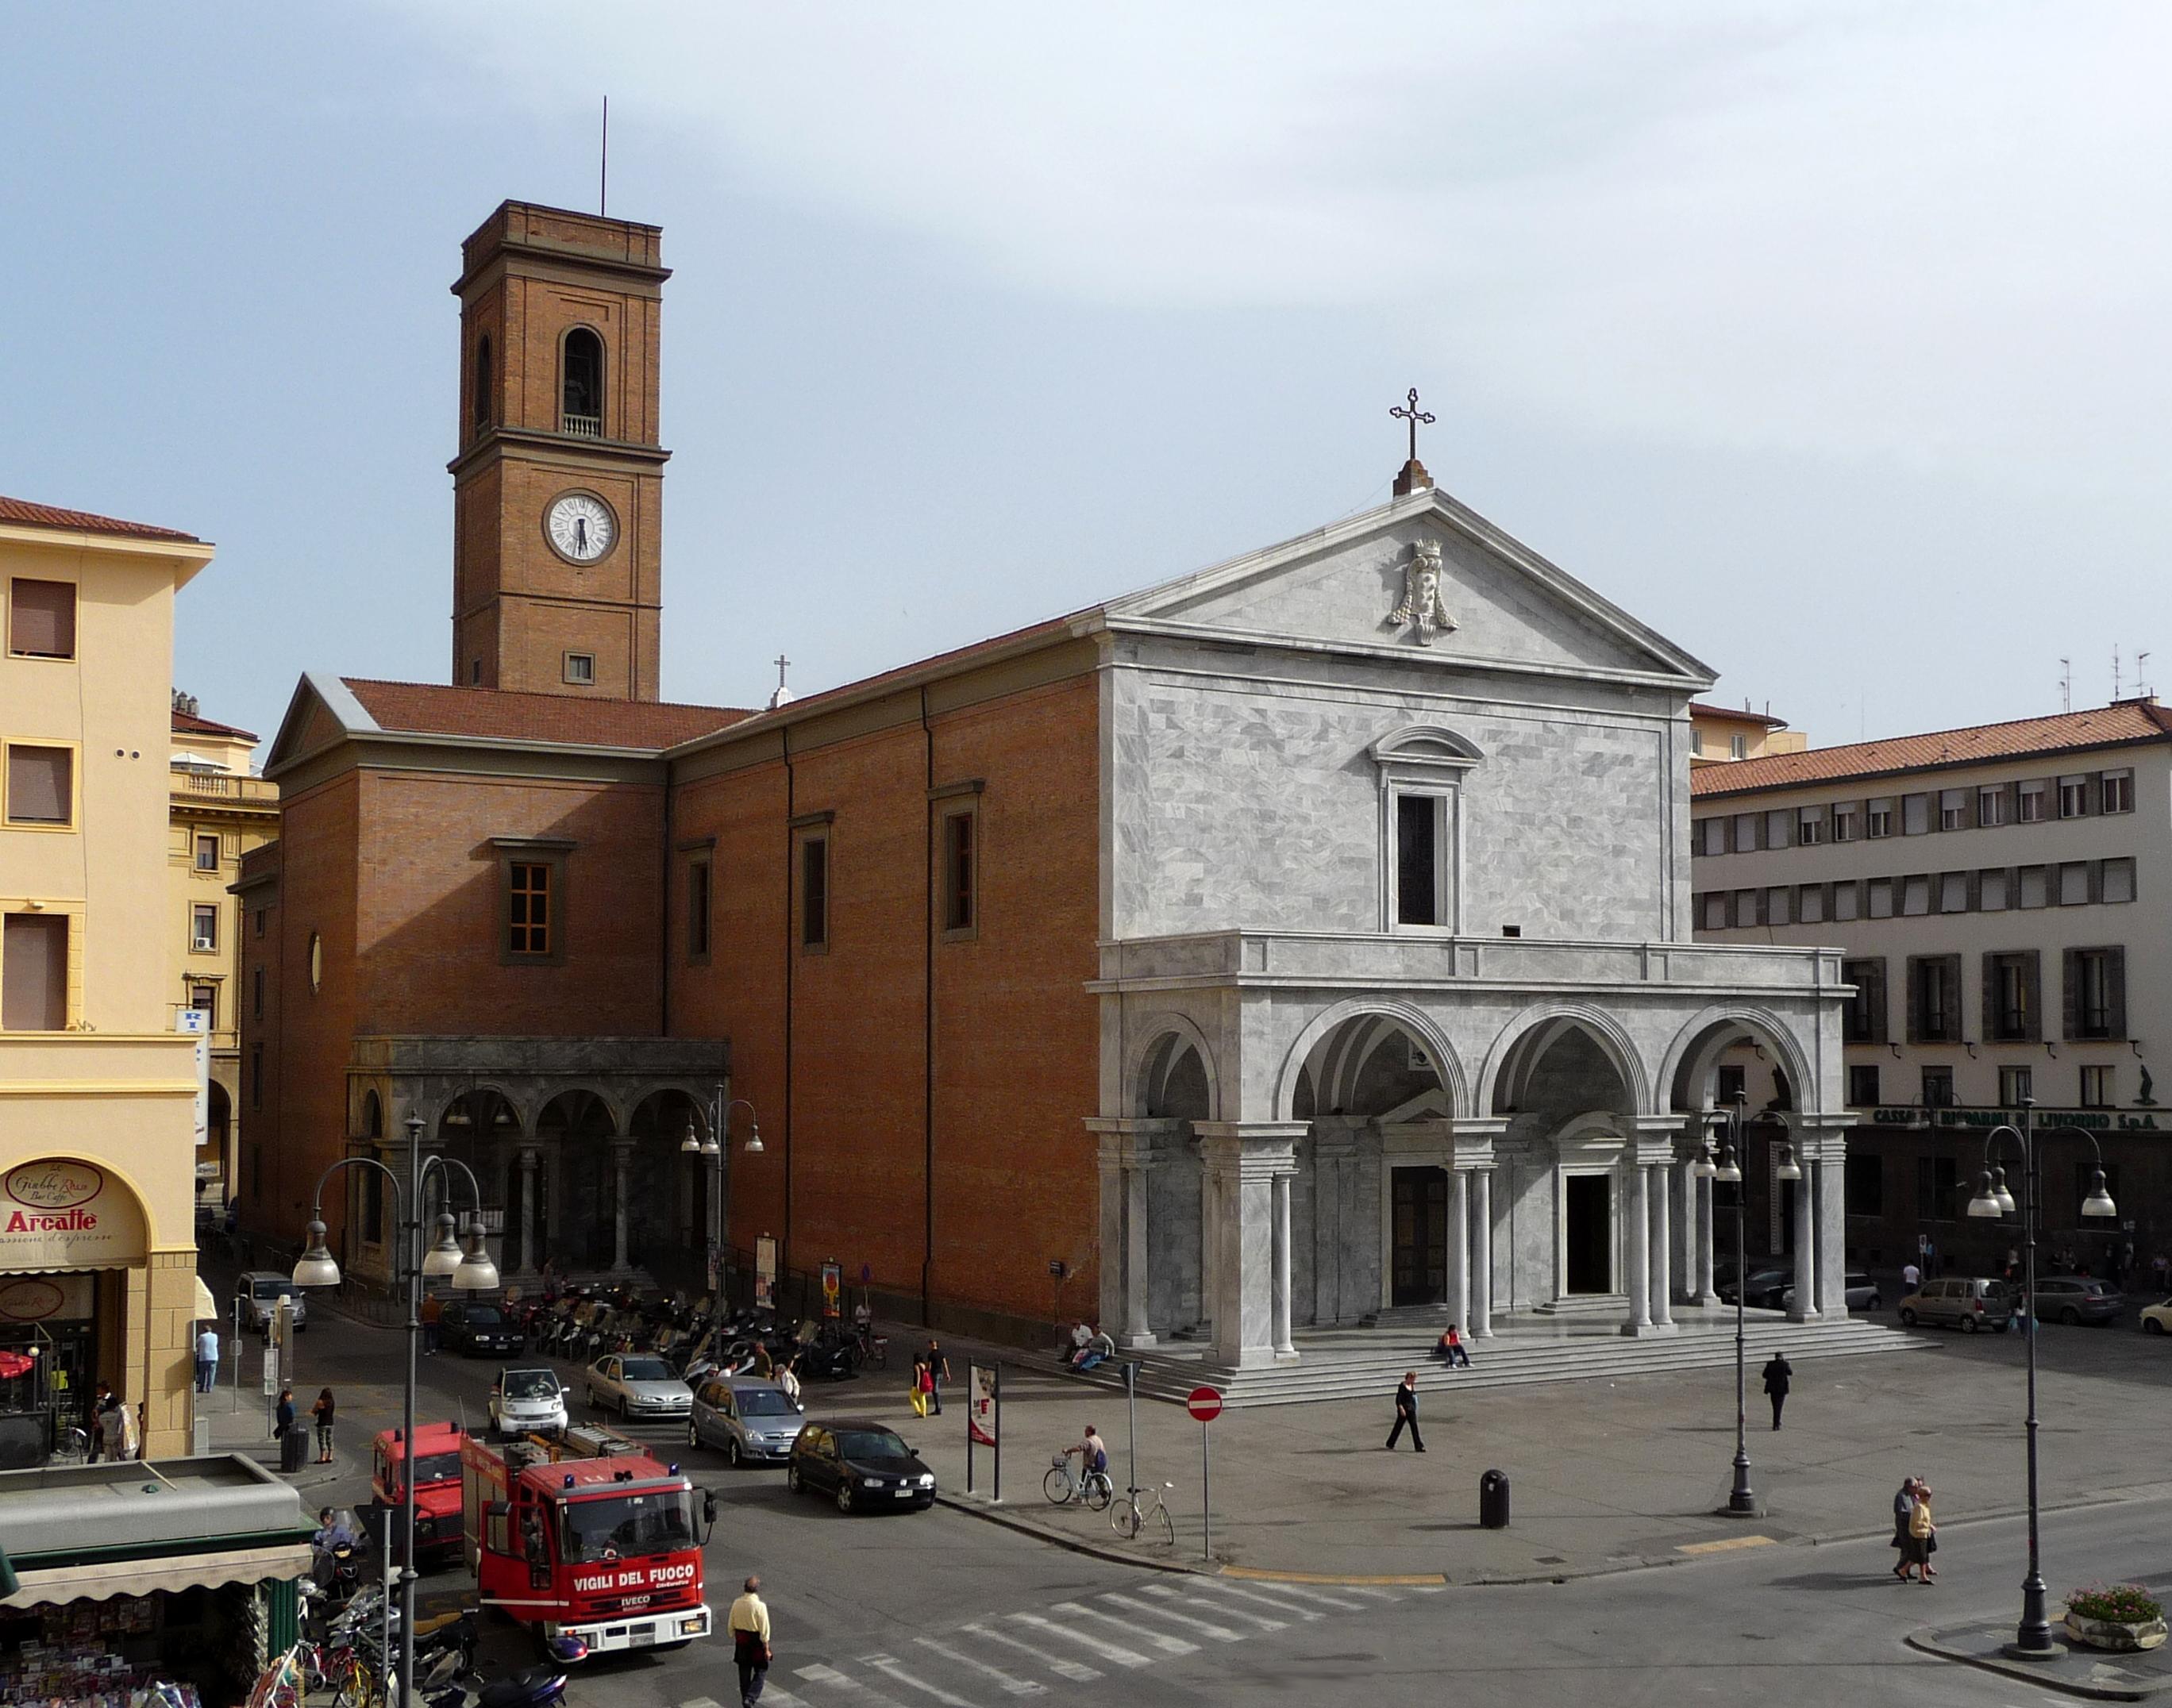 File:Duomo Livorno.JPG - Wikimedia Commons